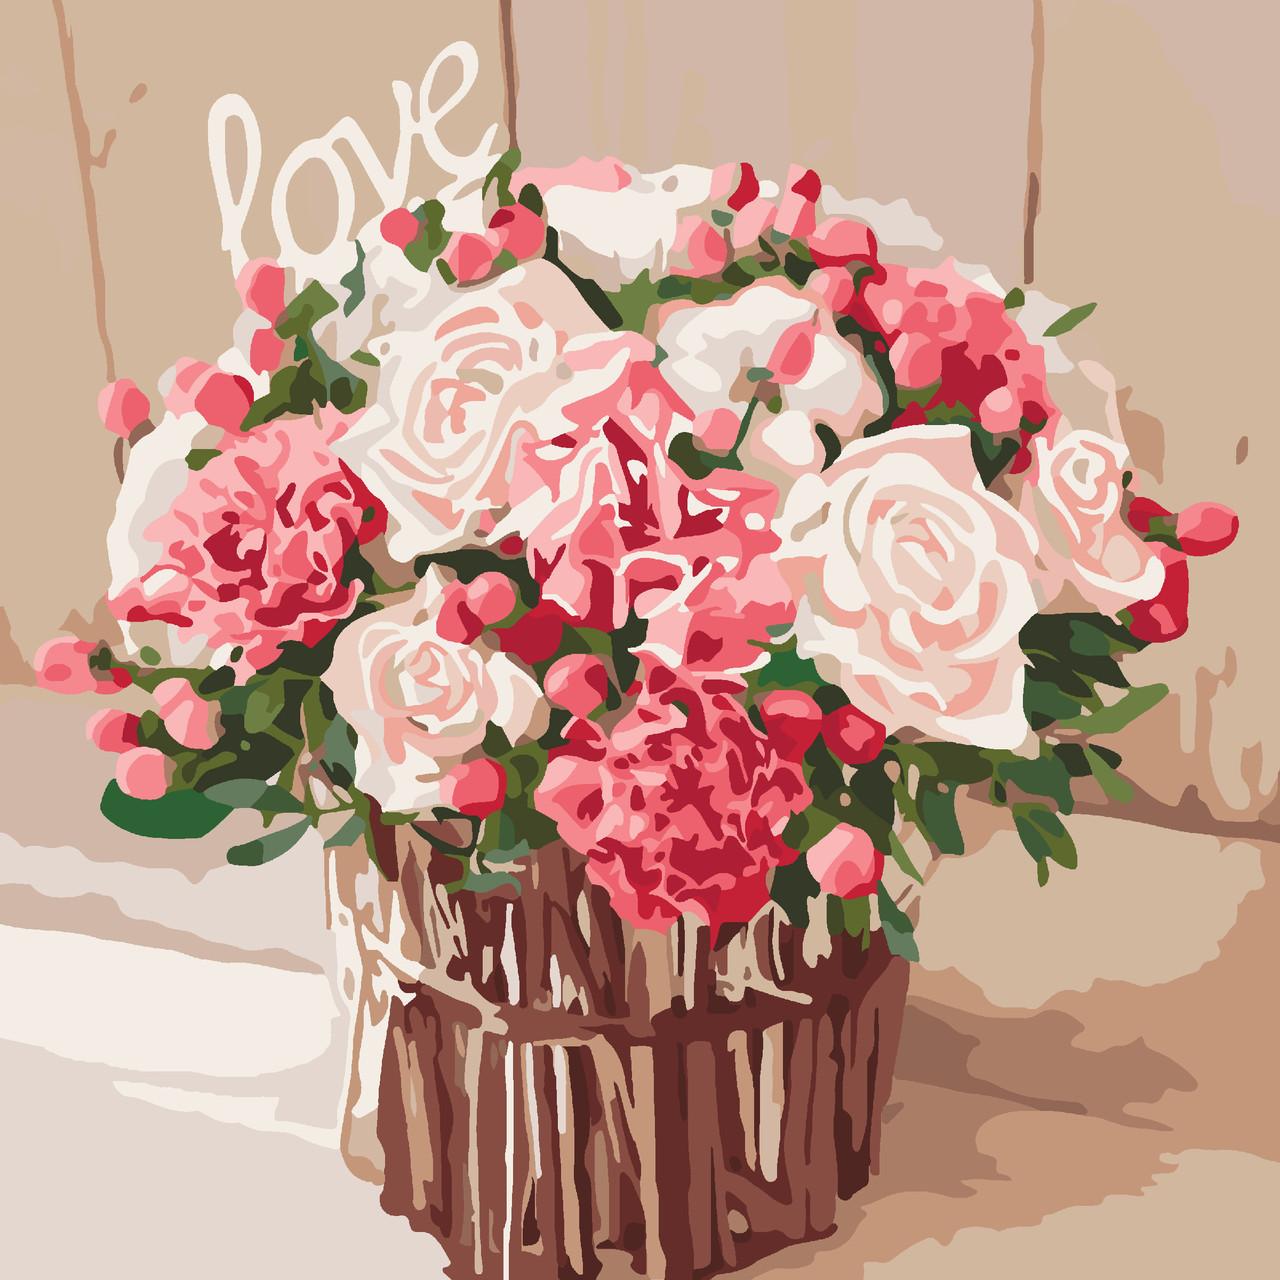 Картина по номерам Розы для любимой 40 х 40 см (KHO2074)